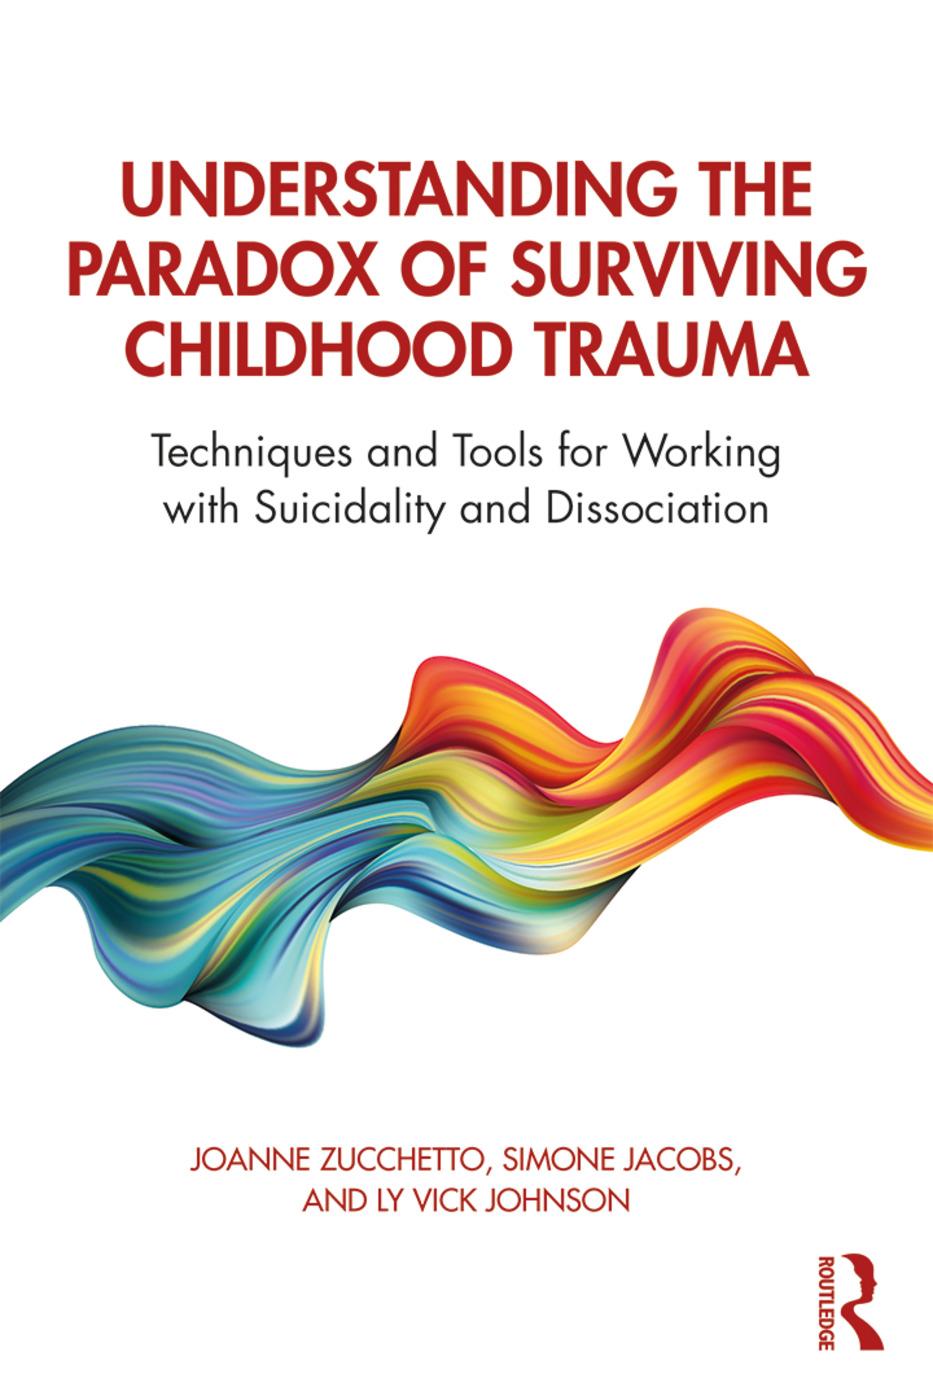 Understanding the Paradox of Surviving Childhood Trauma